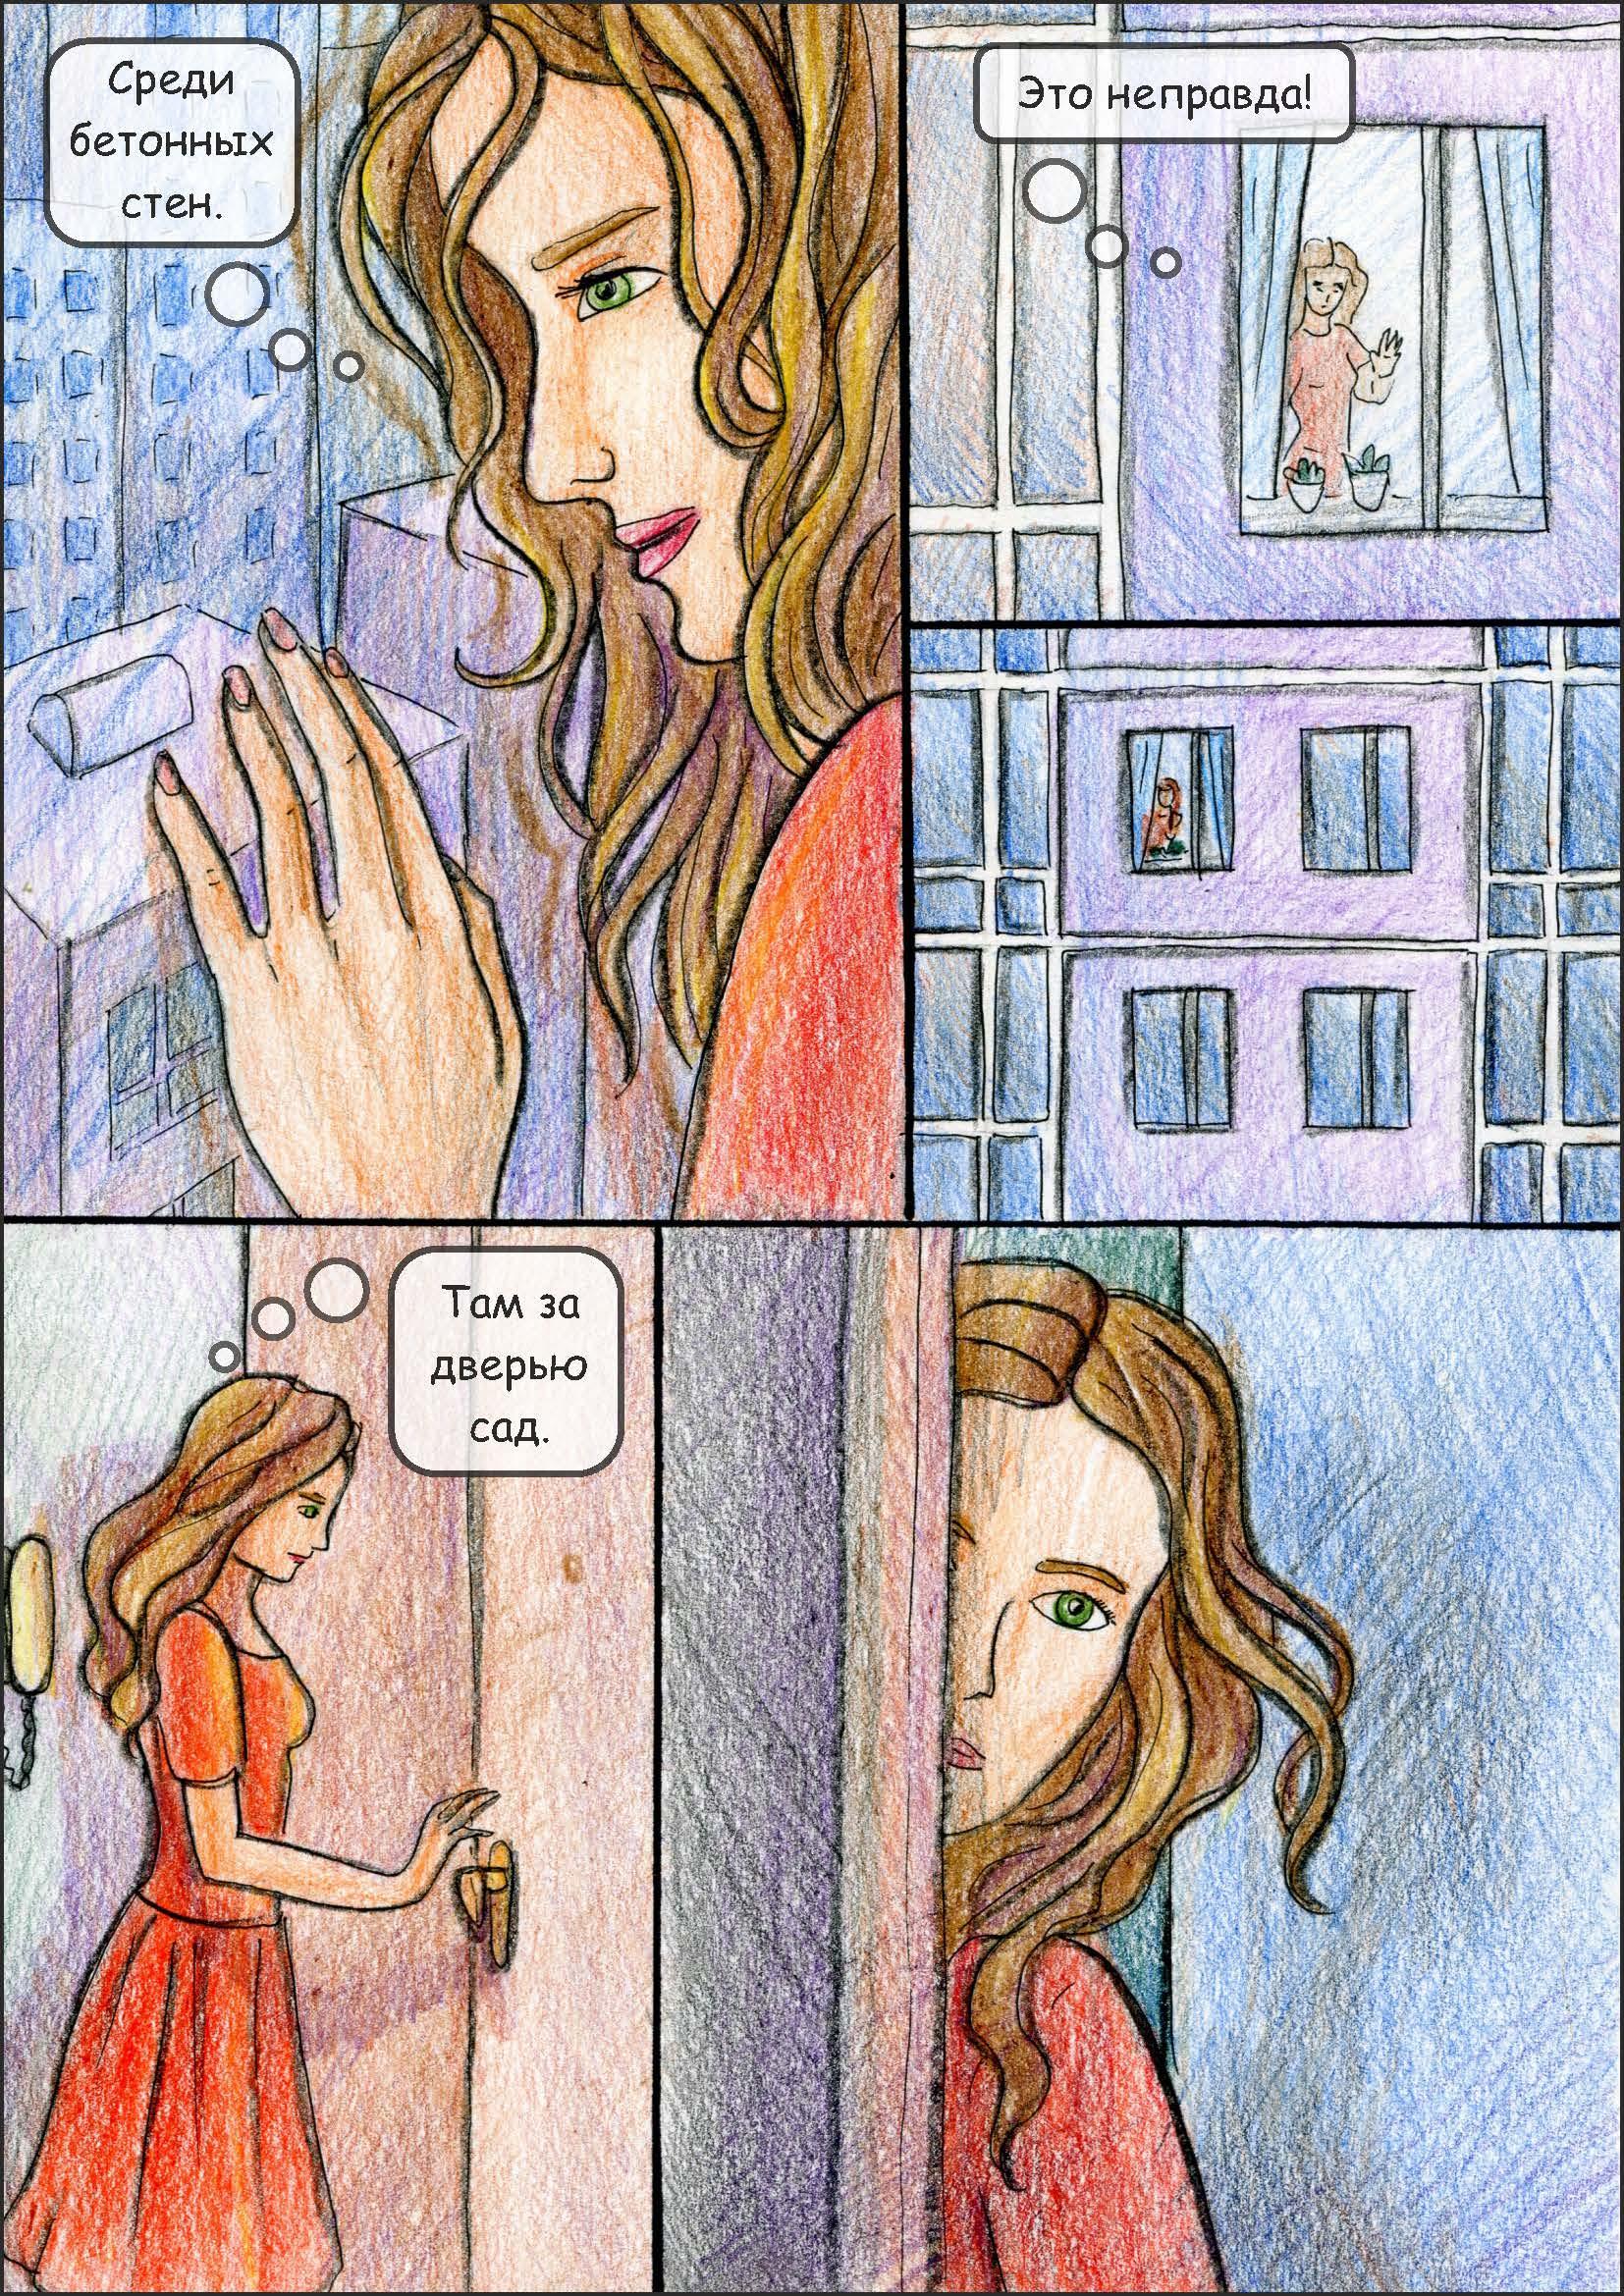 Анна Гейдебрехт. Комикс Зовущая мечта (22).jpg